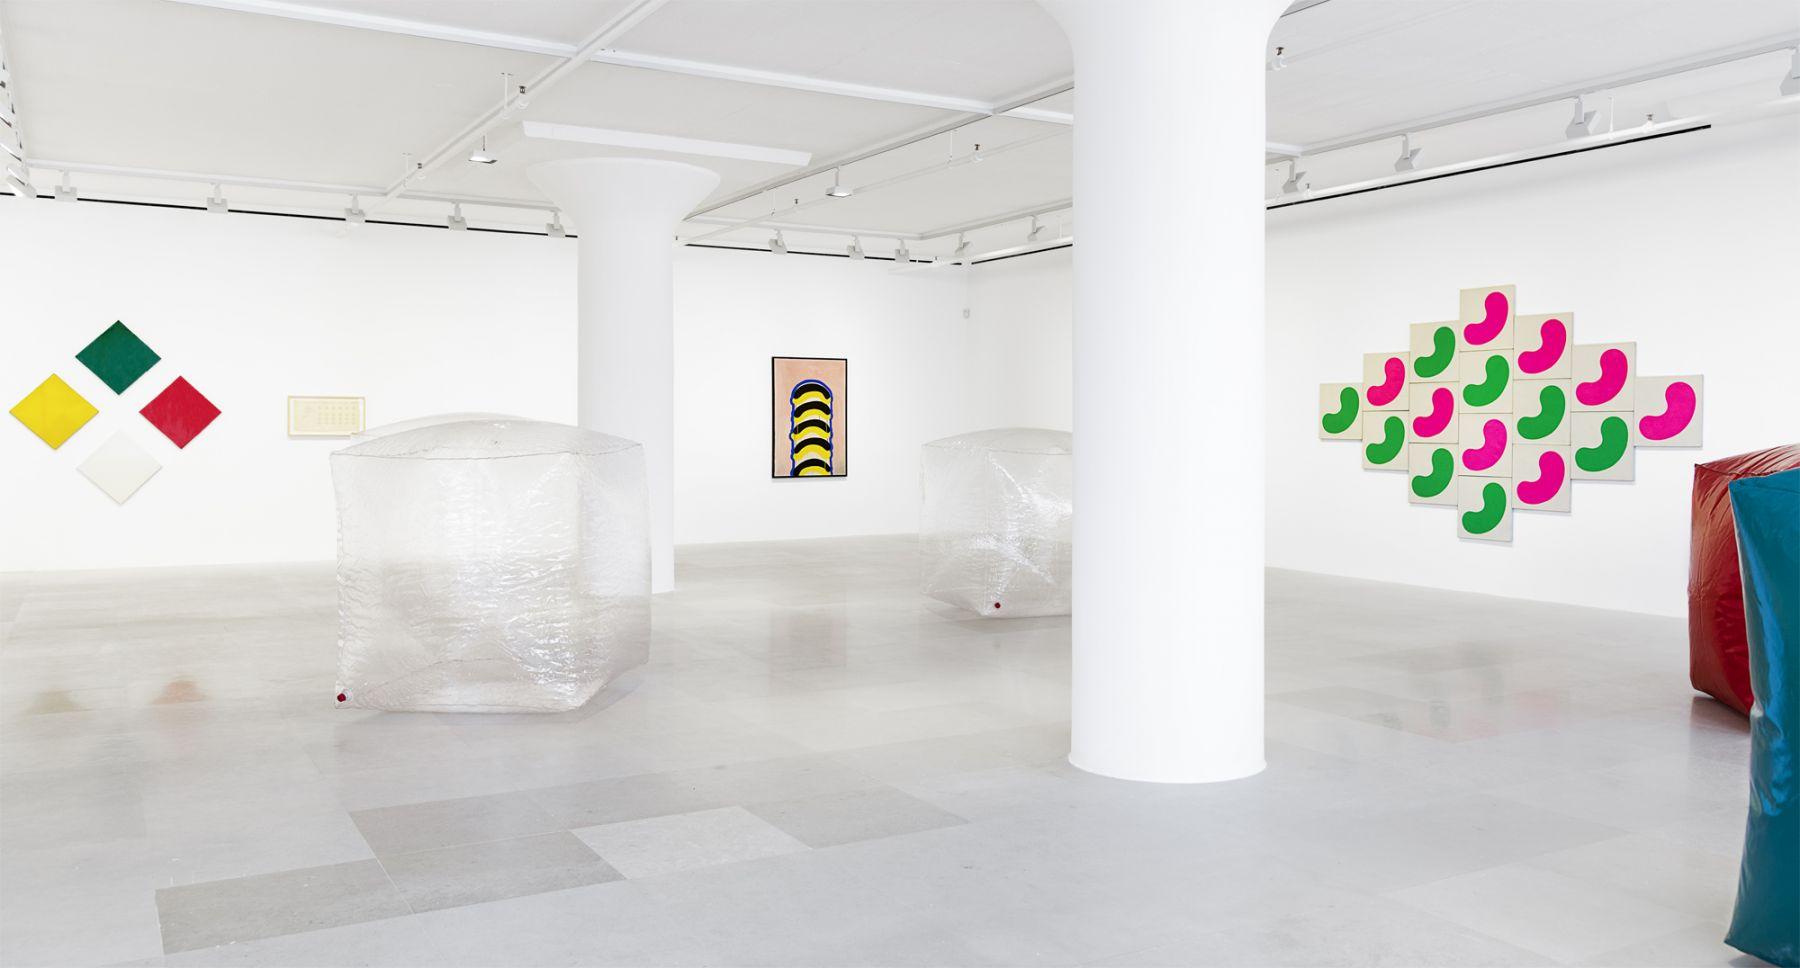 Konrad Lueg, Installation view, Greene Naftali, New York, 2019